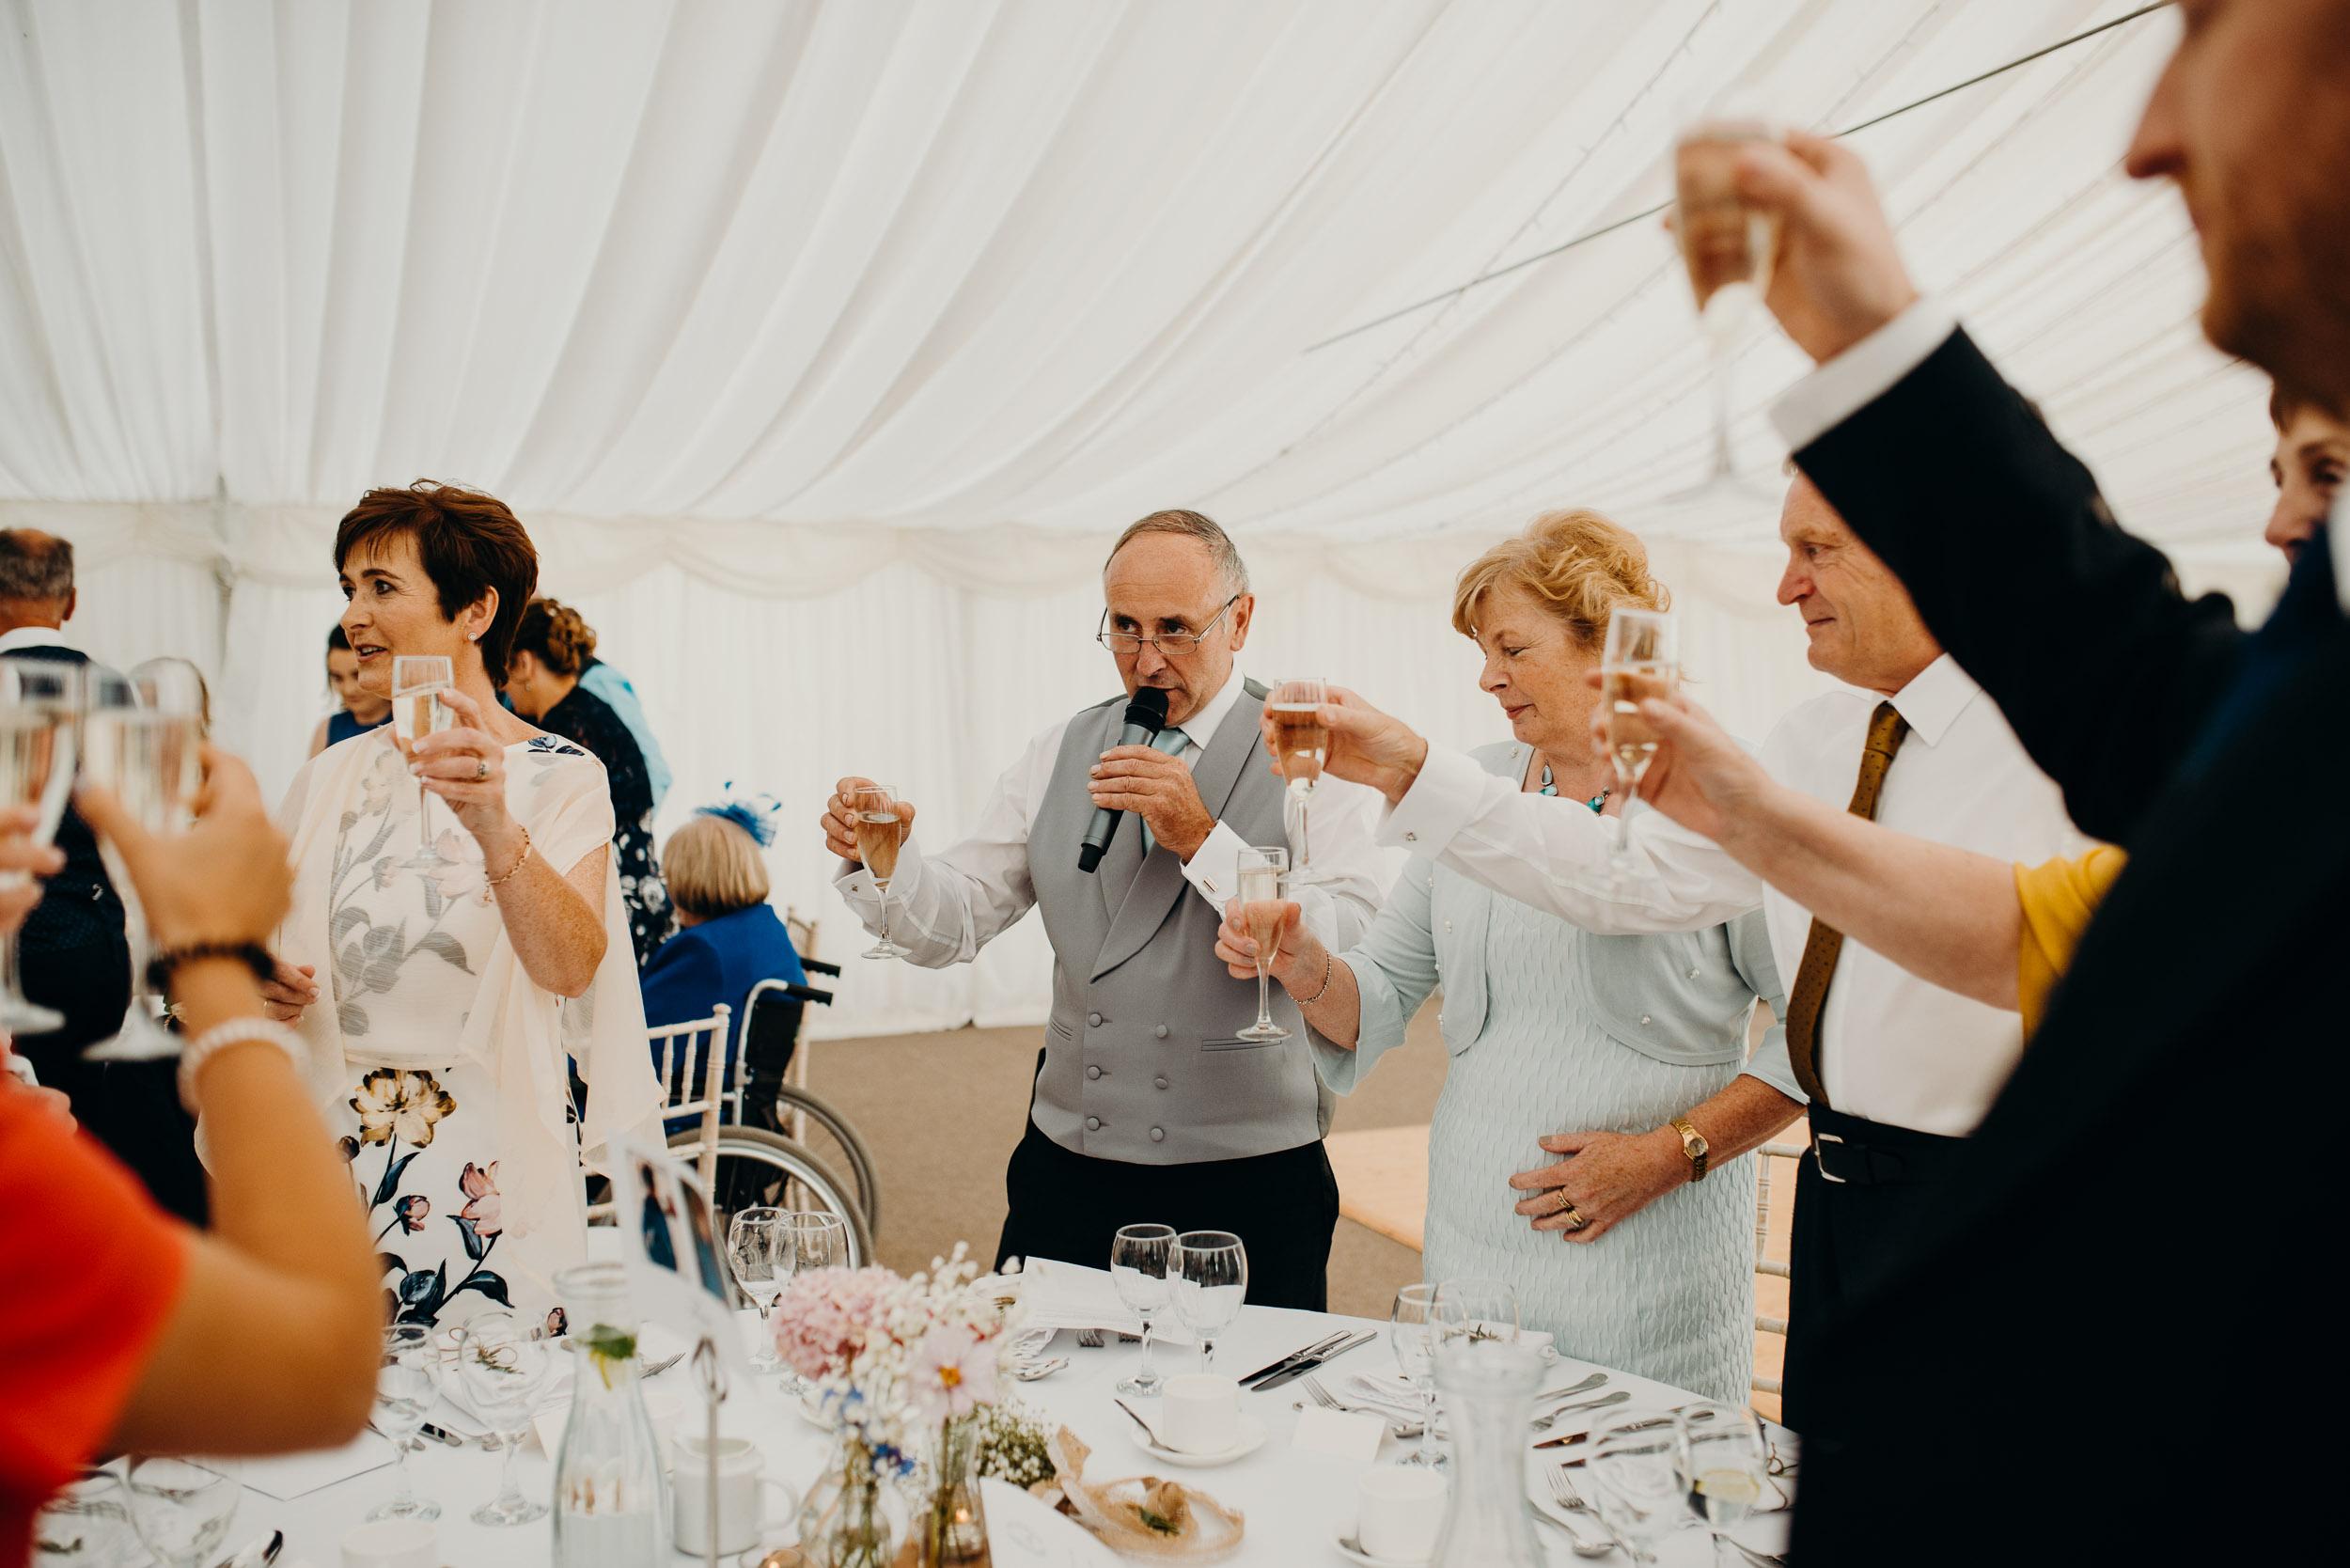 drenagh estate wedding photography-108.jpg